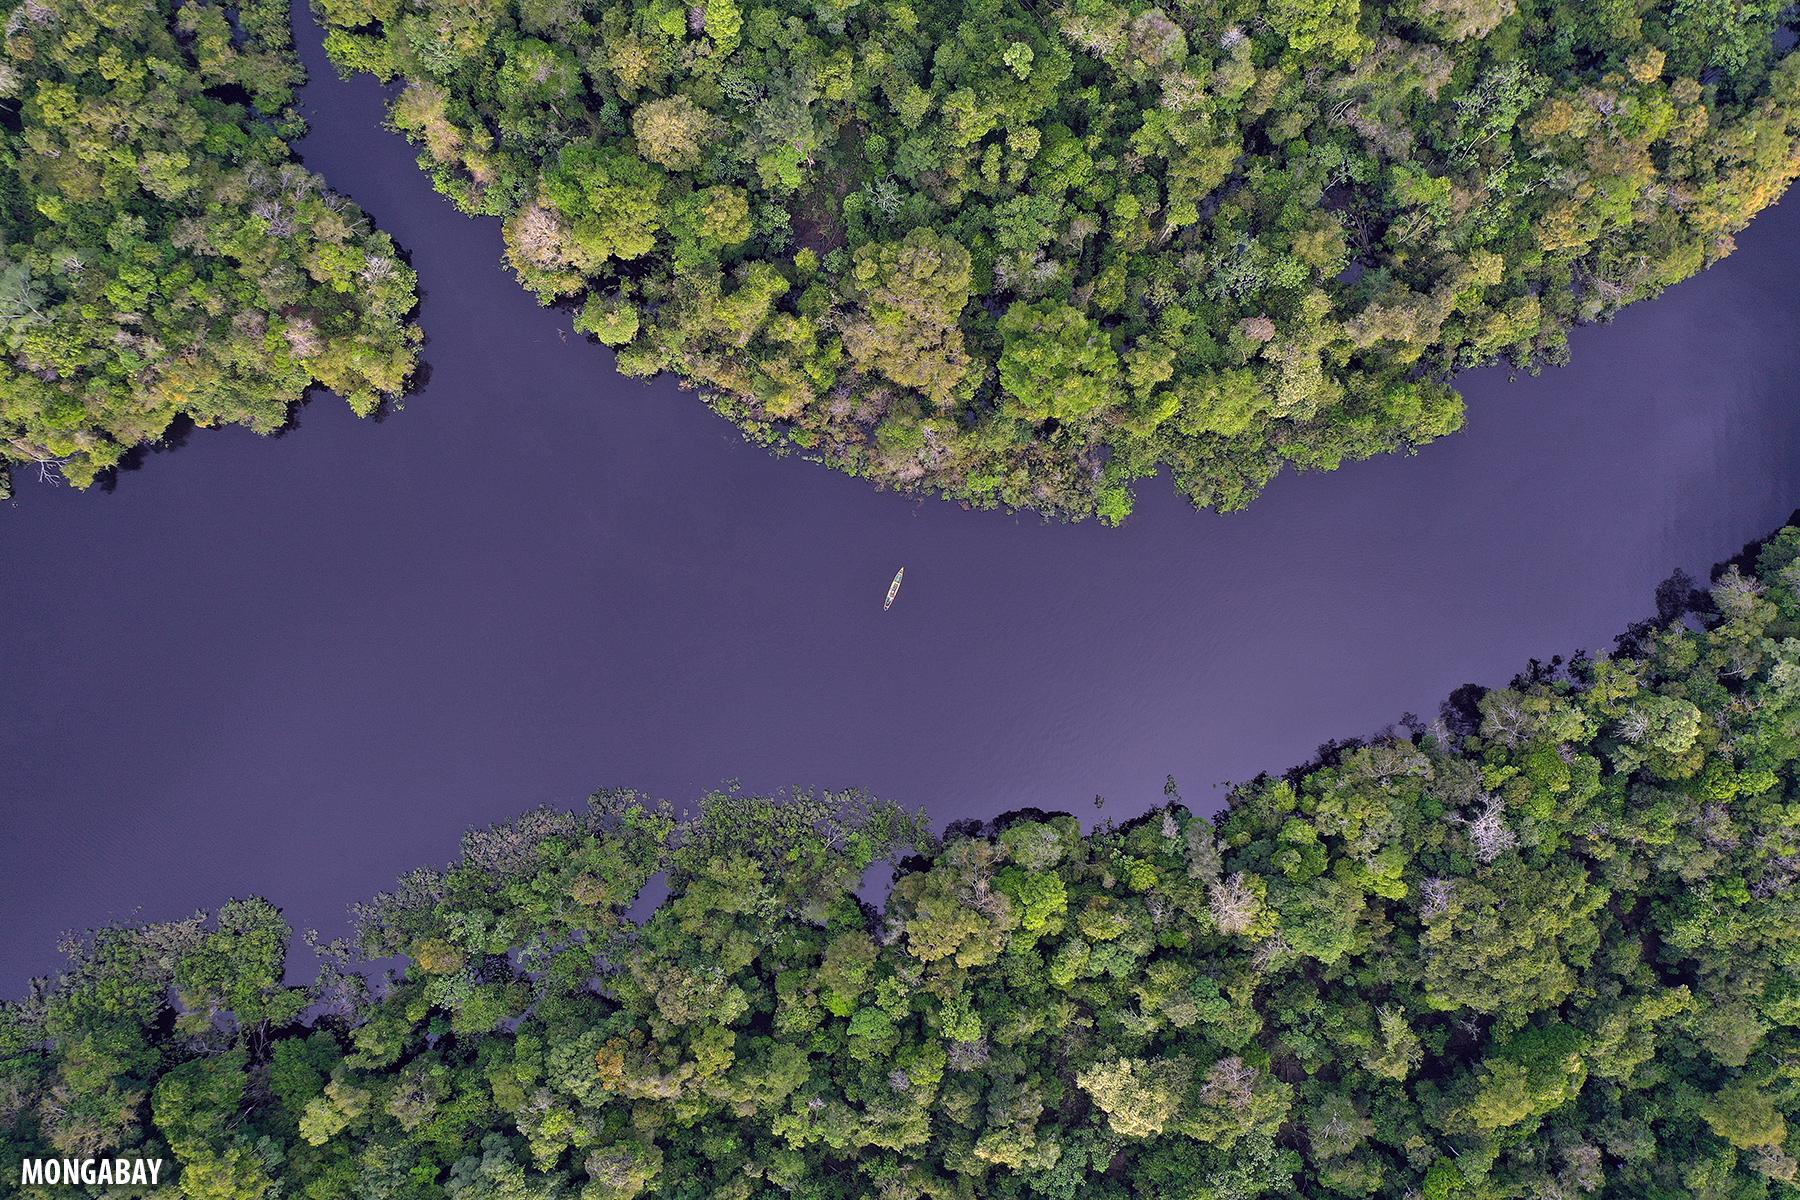 Canoe in the Zacambu river, Peru. Photo by Rhett A. Butler for Mongabay.